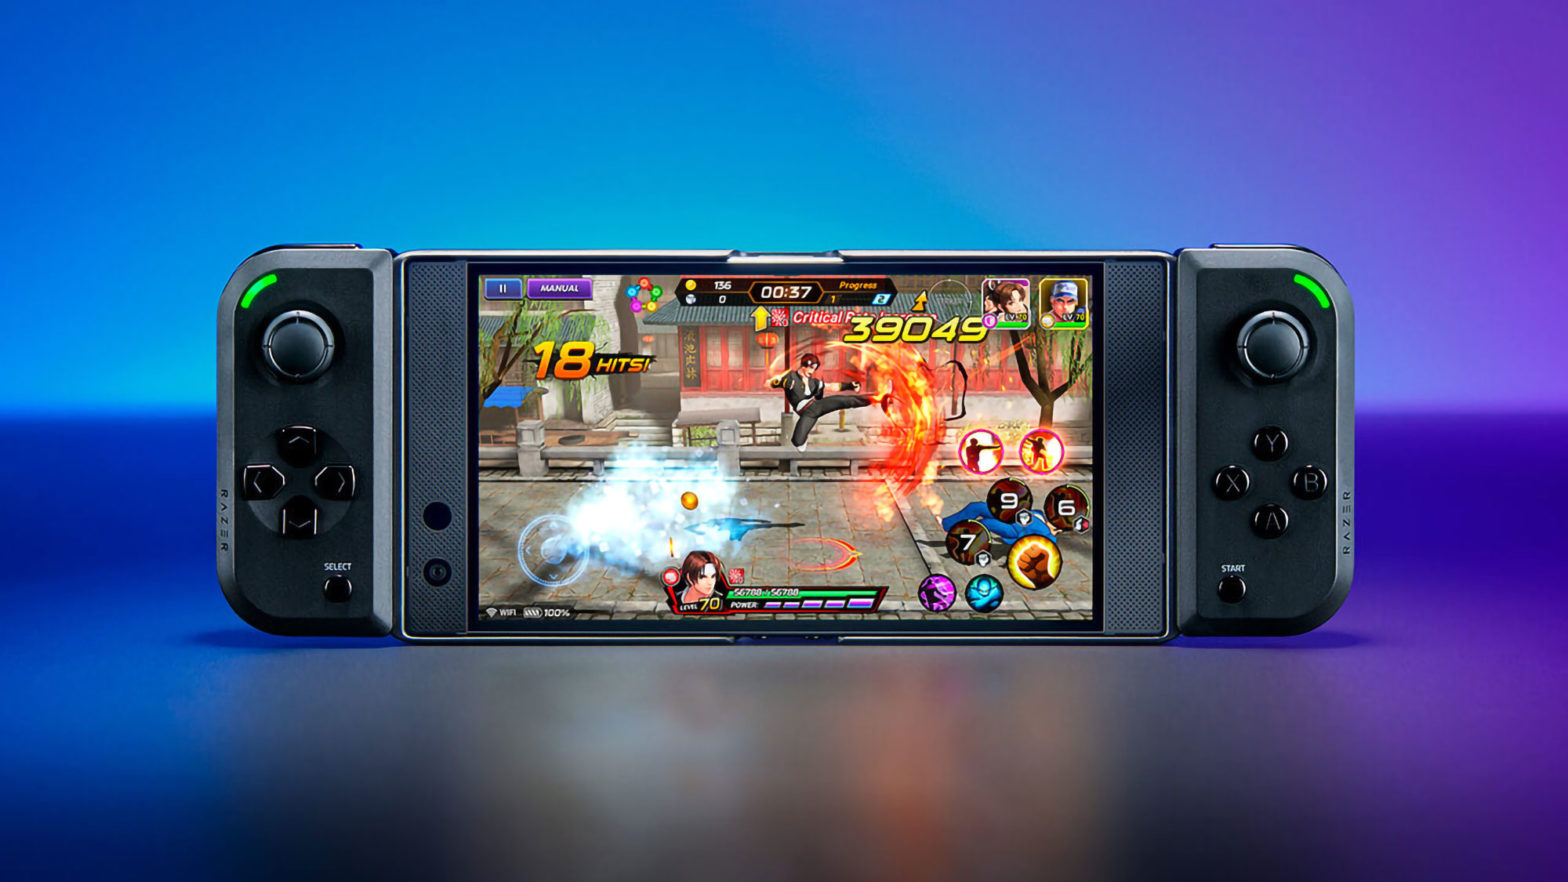 Razer Junglecat Mobile Gaming Controller